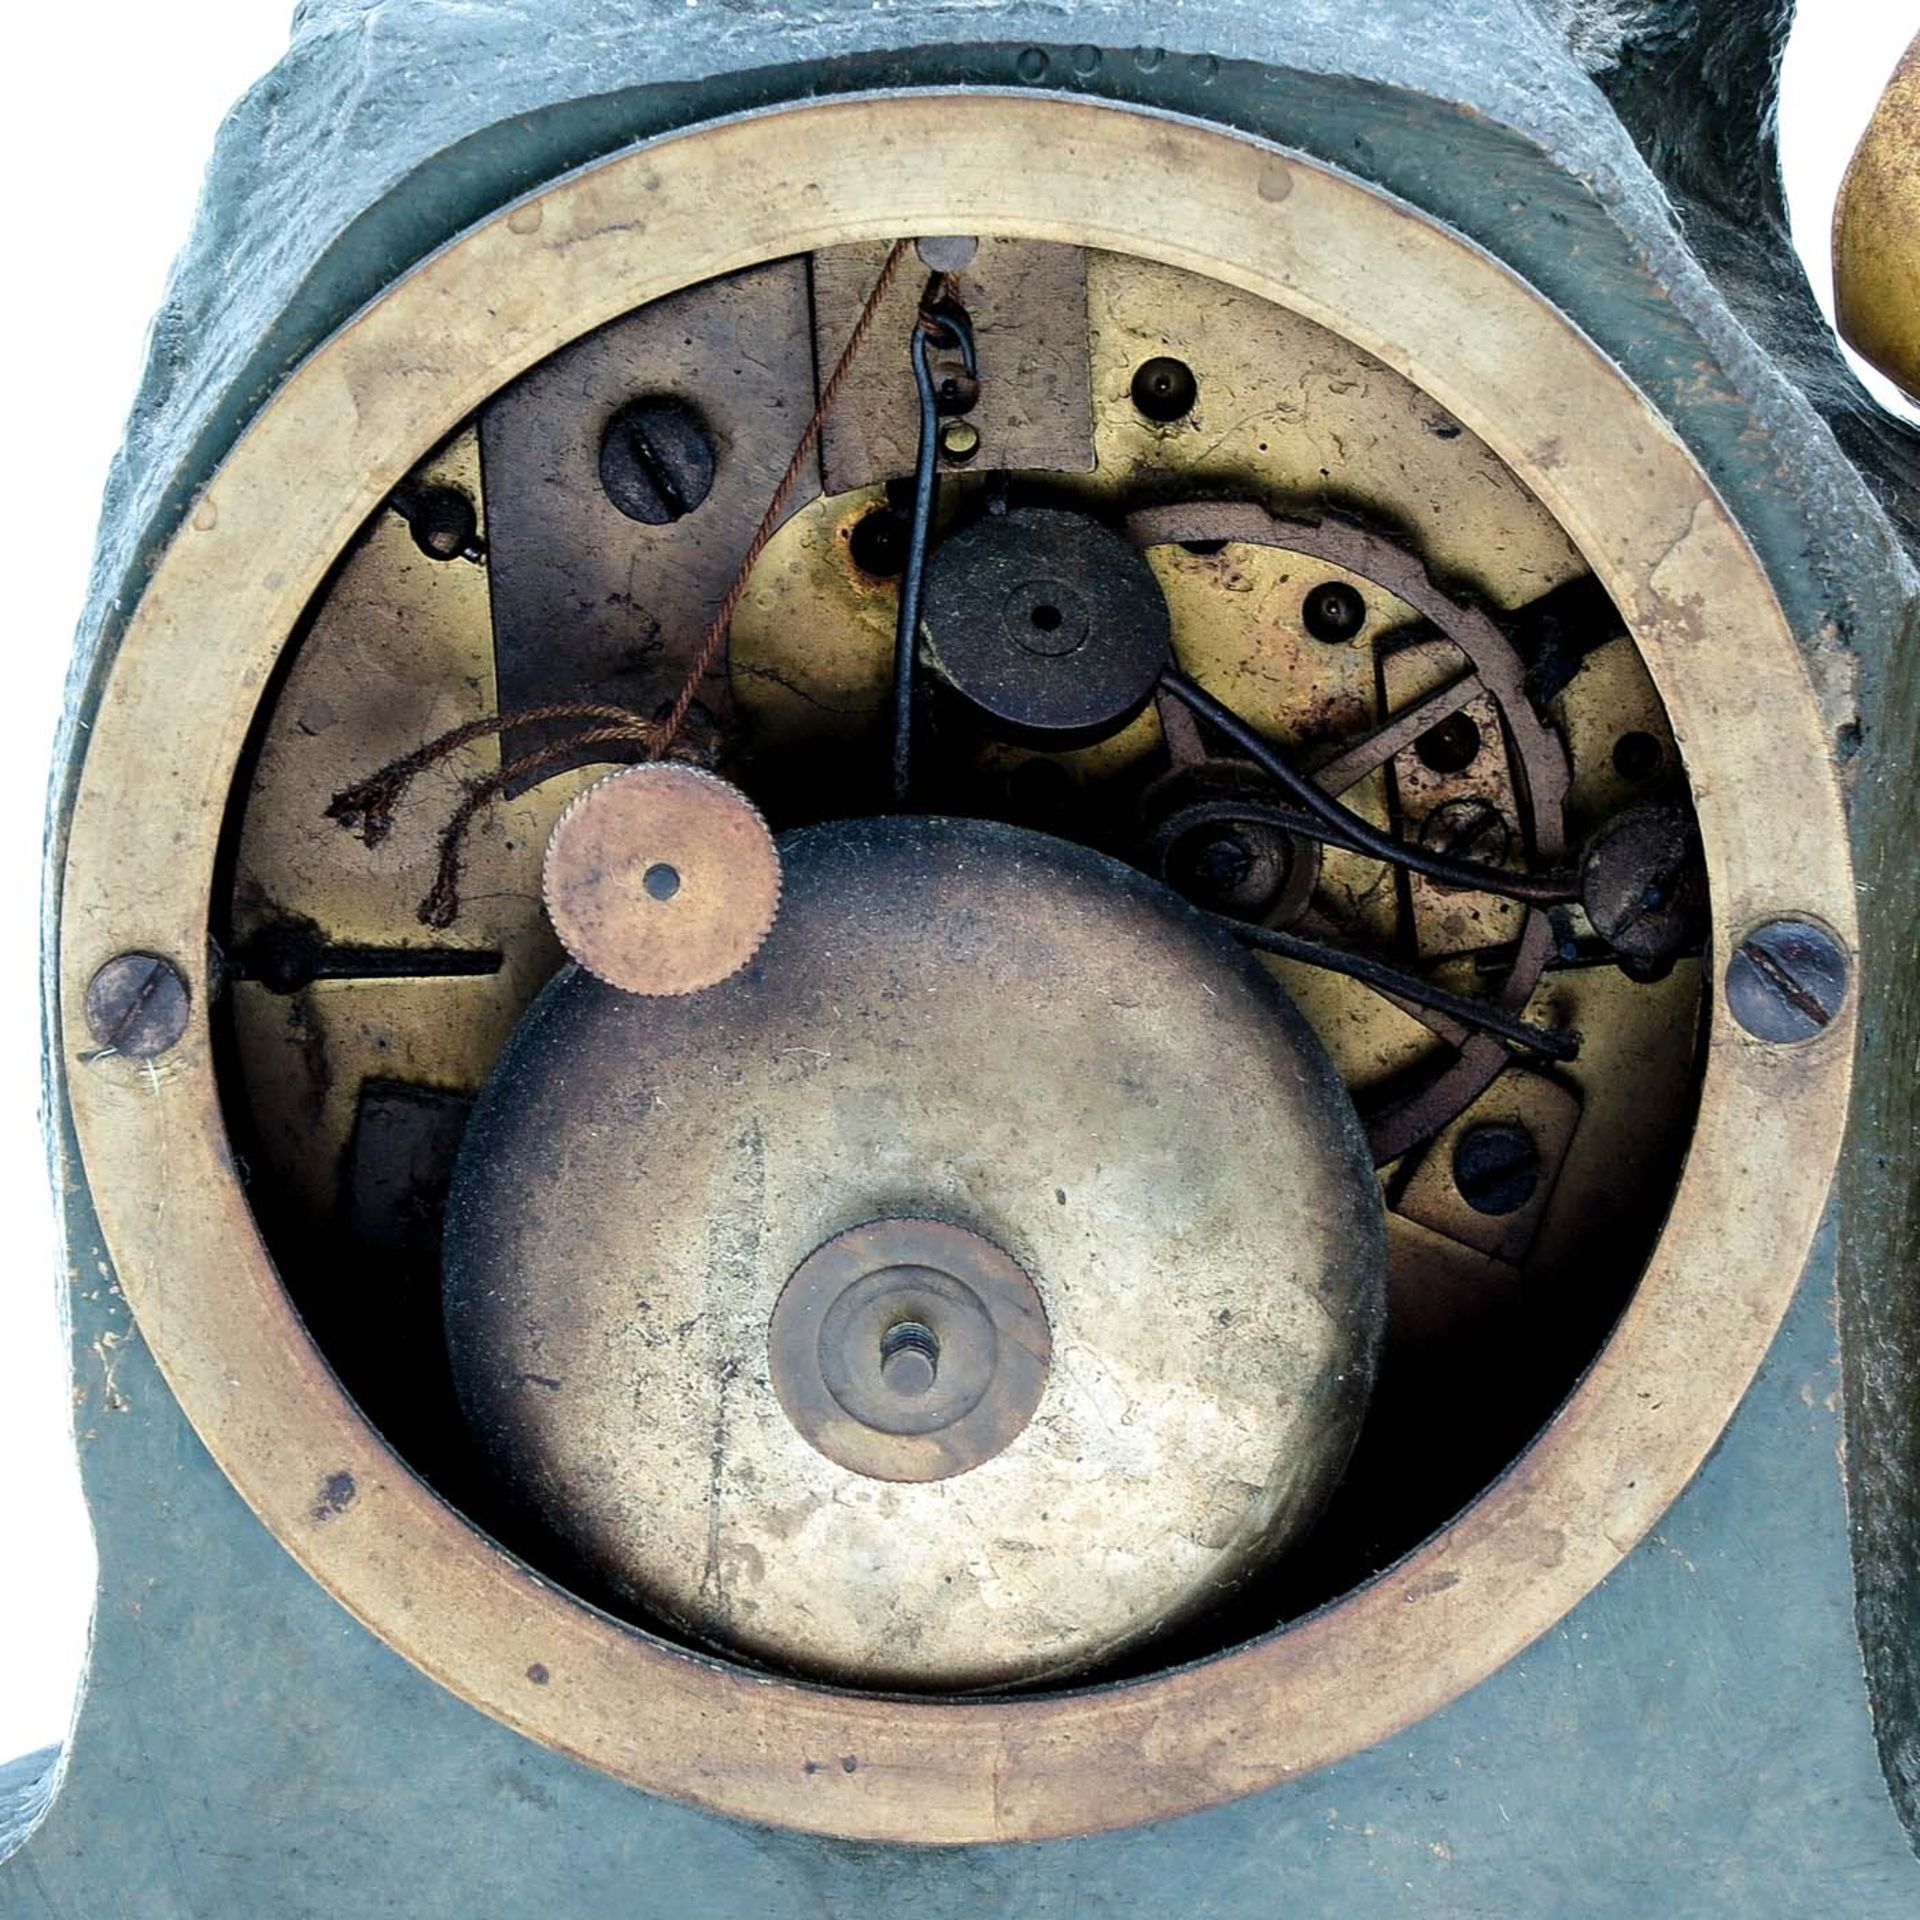 Los 1185 - A 19th Century French Pendulum